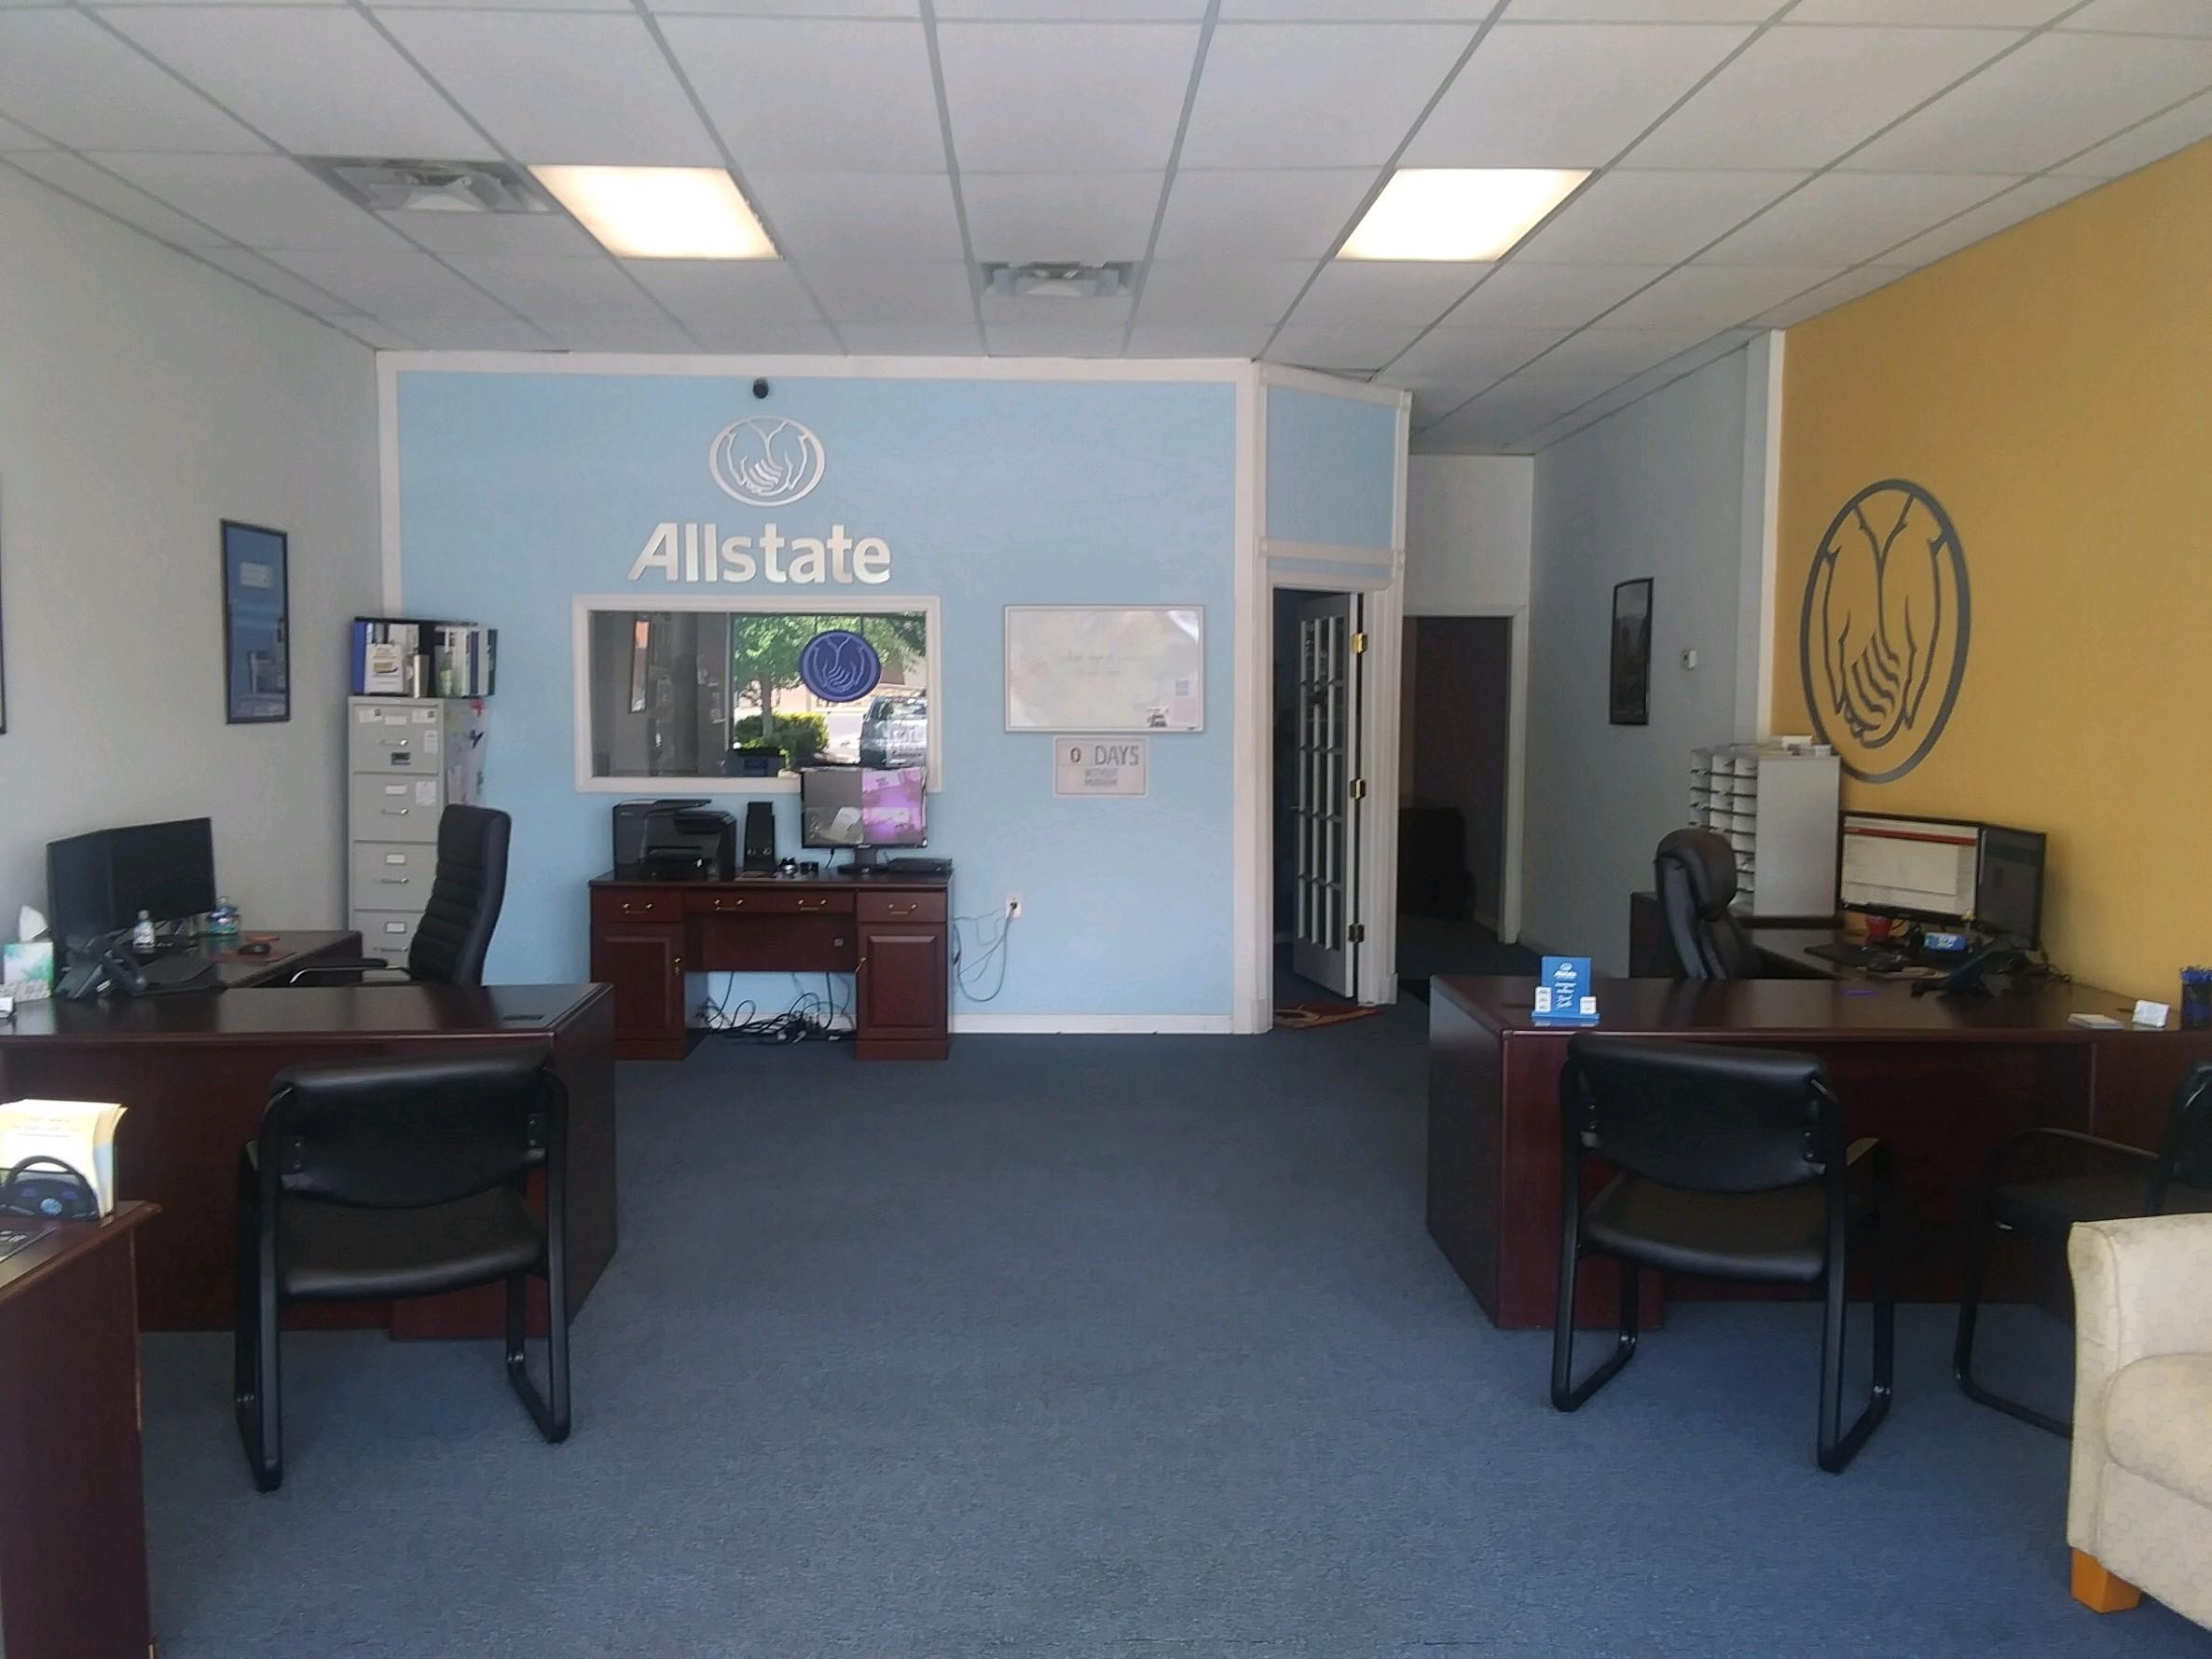 Greg Smith: Allstate Insurance image 2